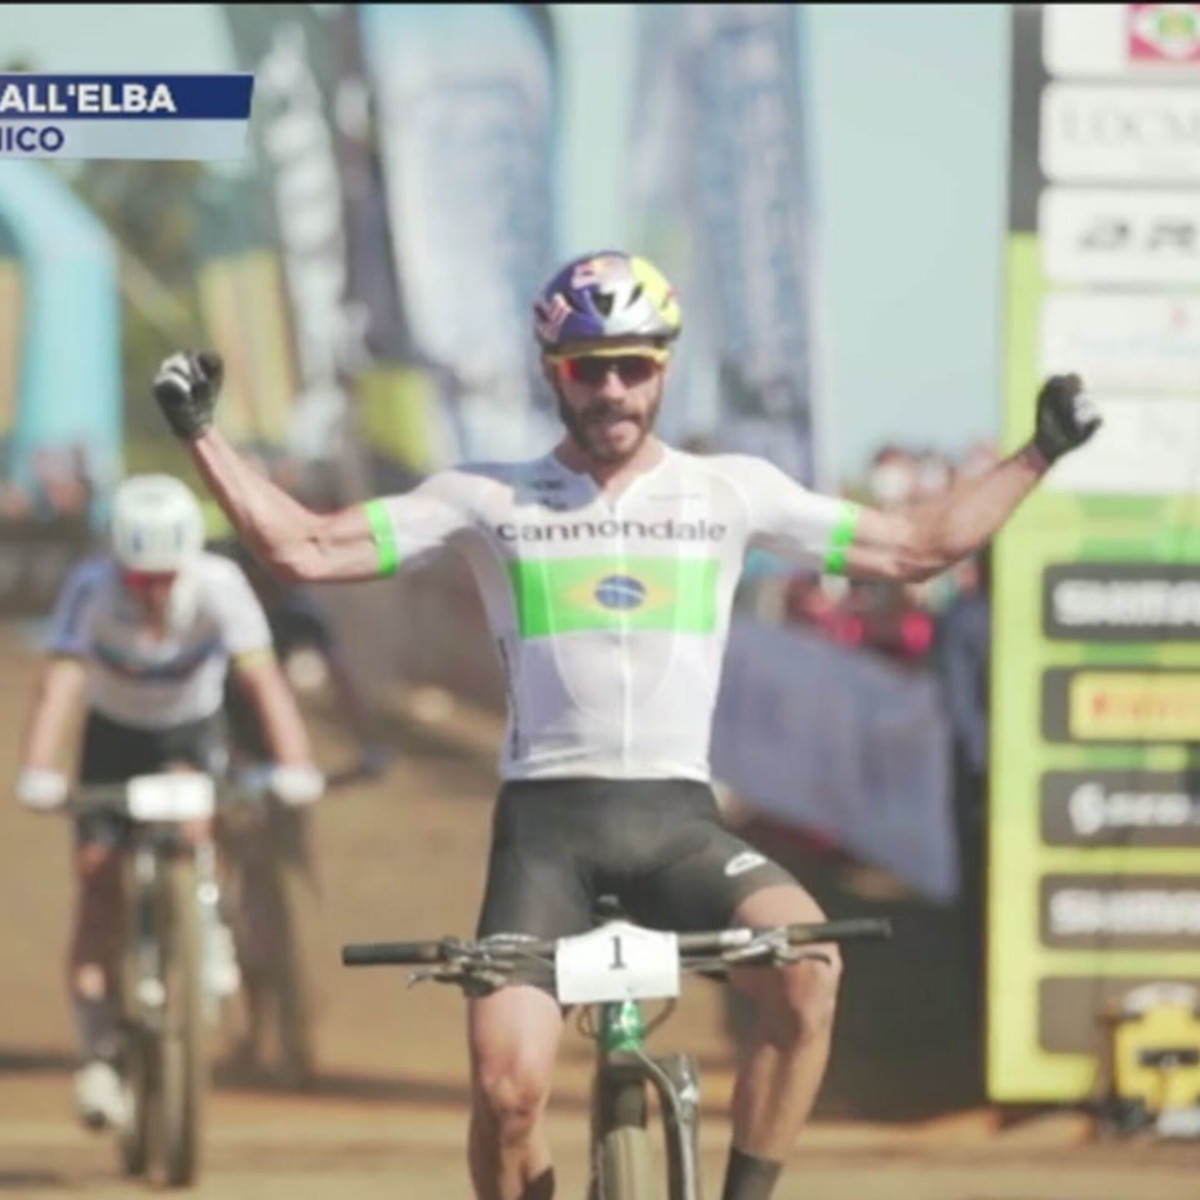 Mountain Bike, spettacolo all'Elba